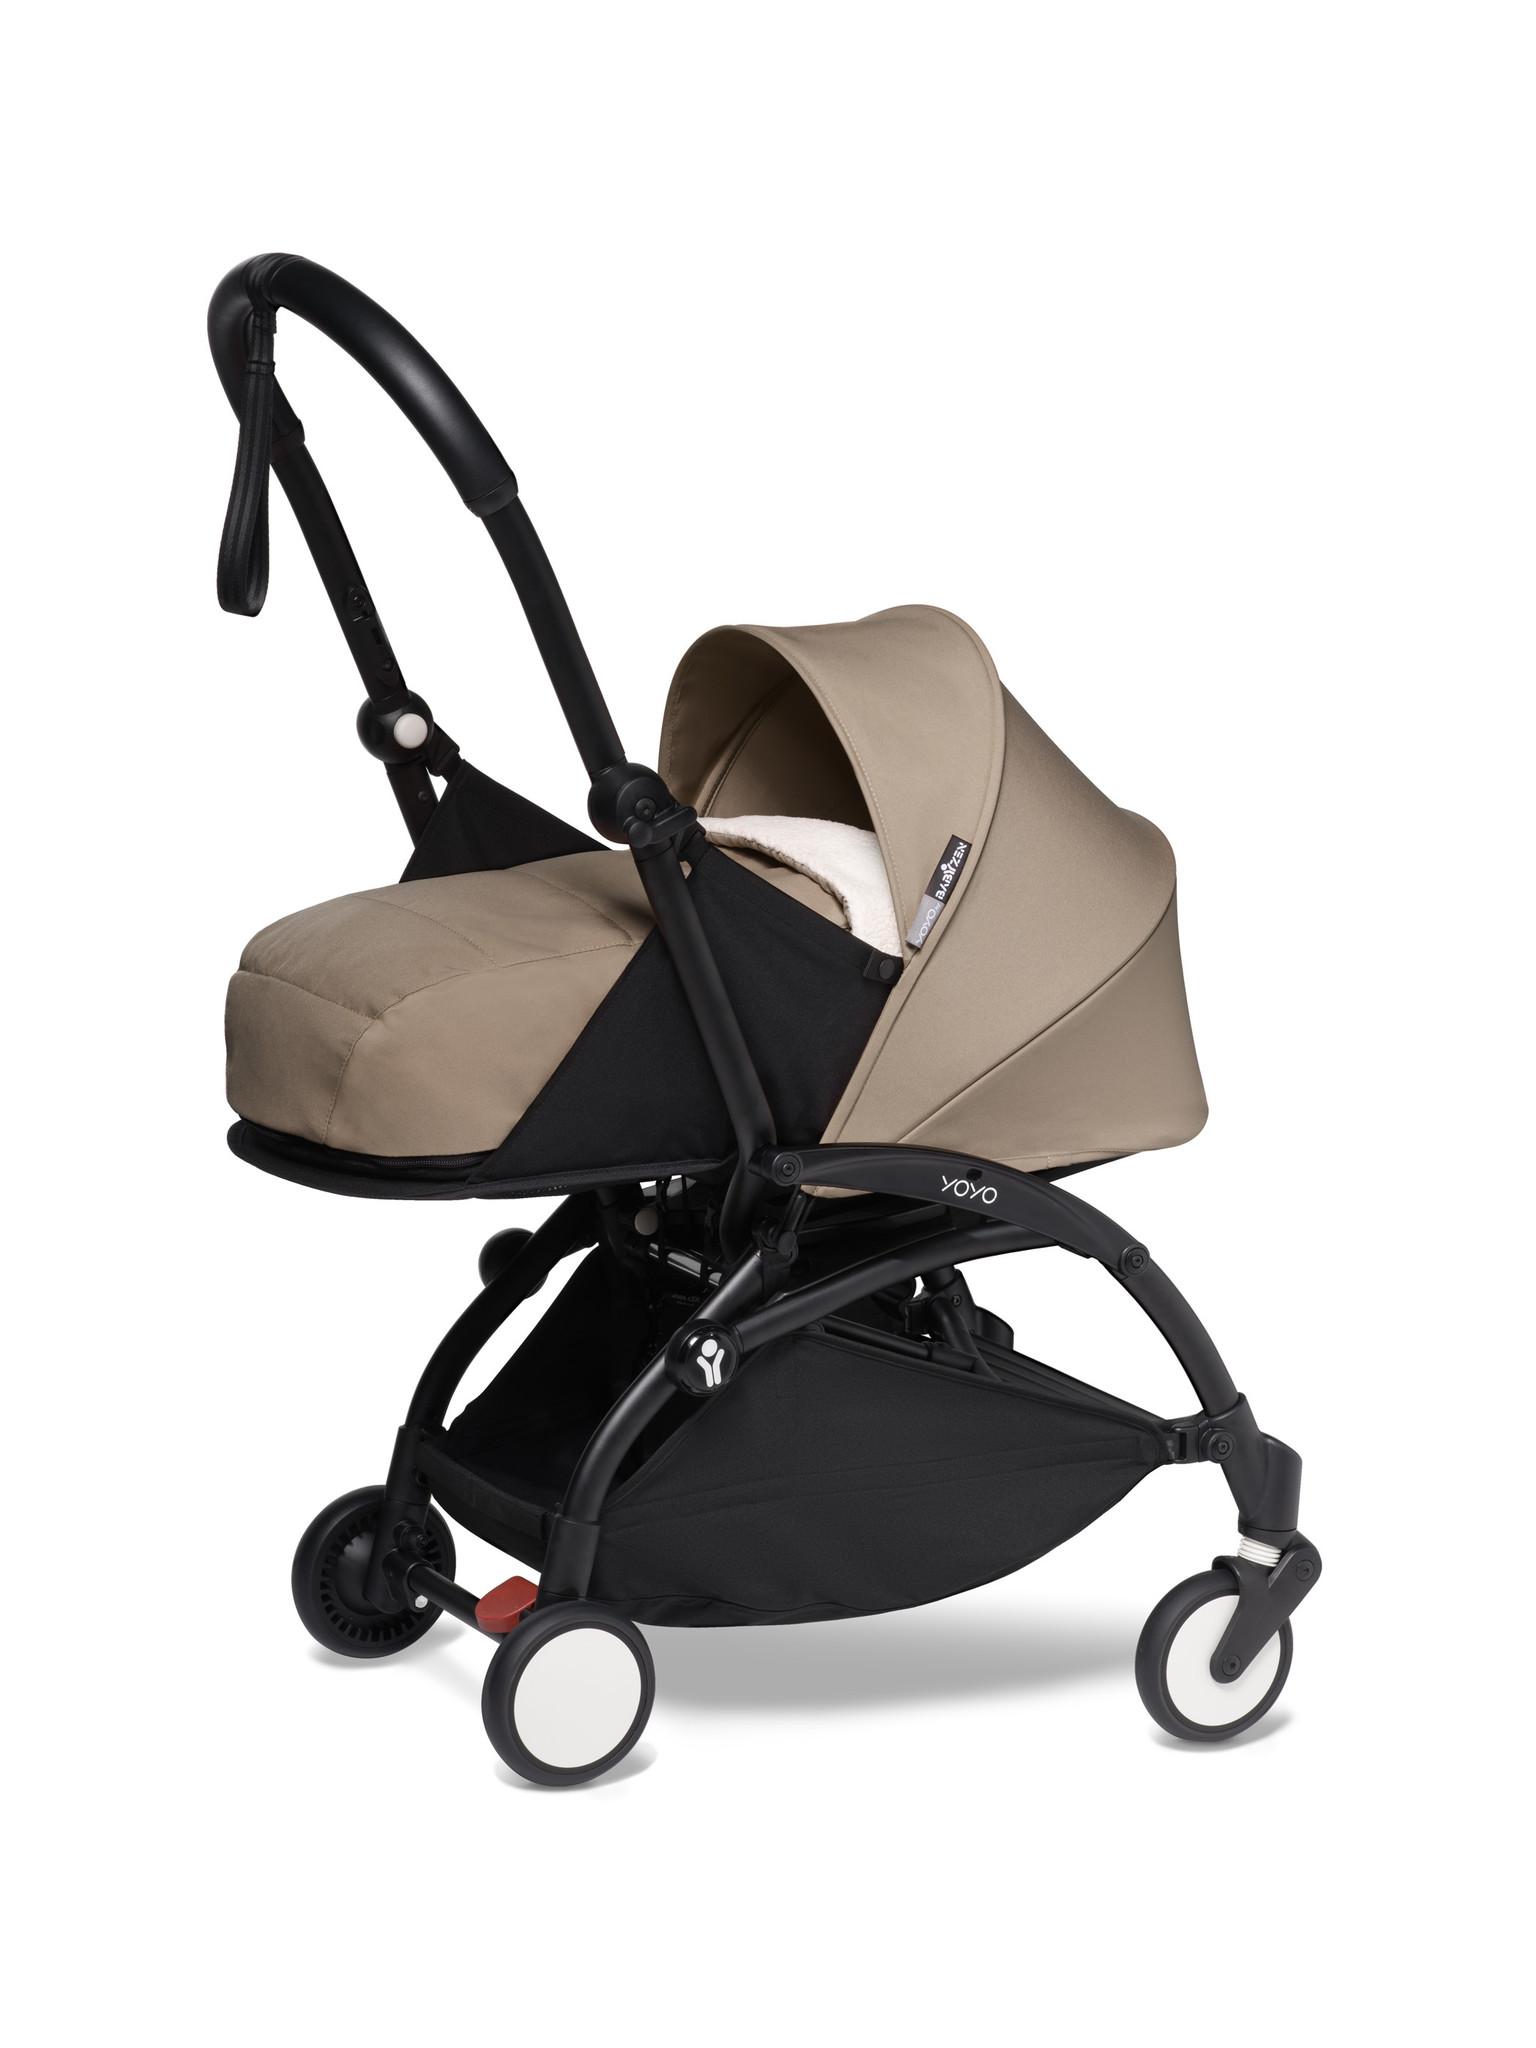 Babyzen Babyzen YOYO² buggy COMPLEET / FULL SET 0+ and 6+ taupe frame zwart incl. YOYO² BeSafe autostoel zwart